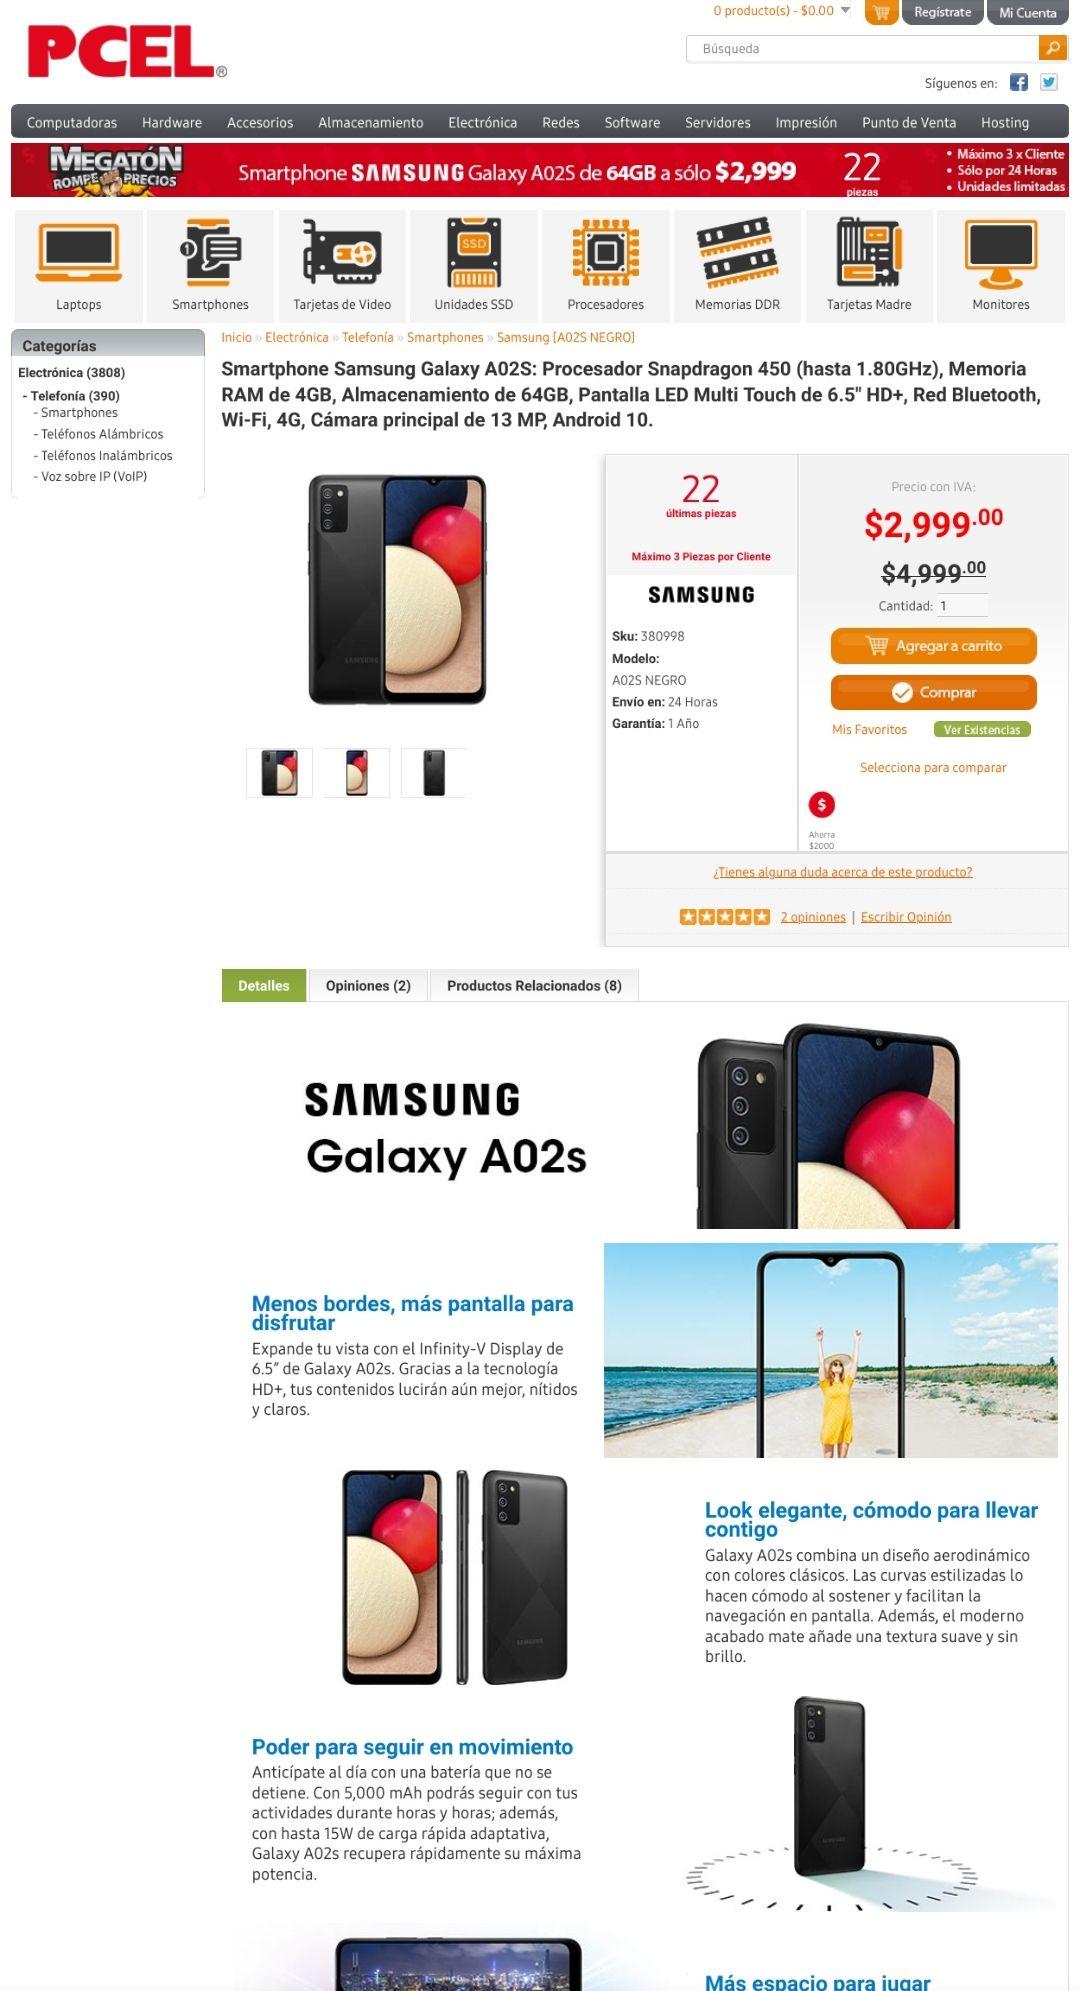 PCEL: Smartphone Samsung Galaxy A02S